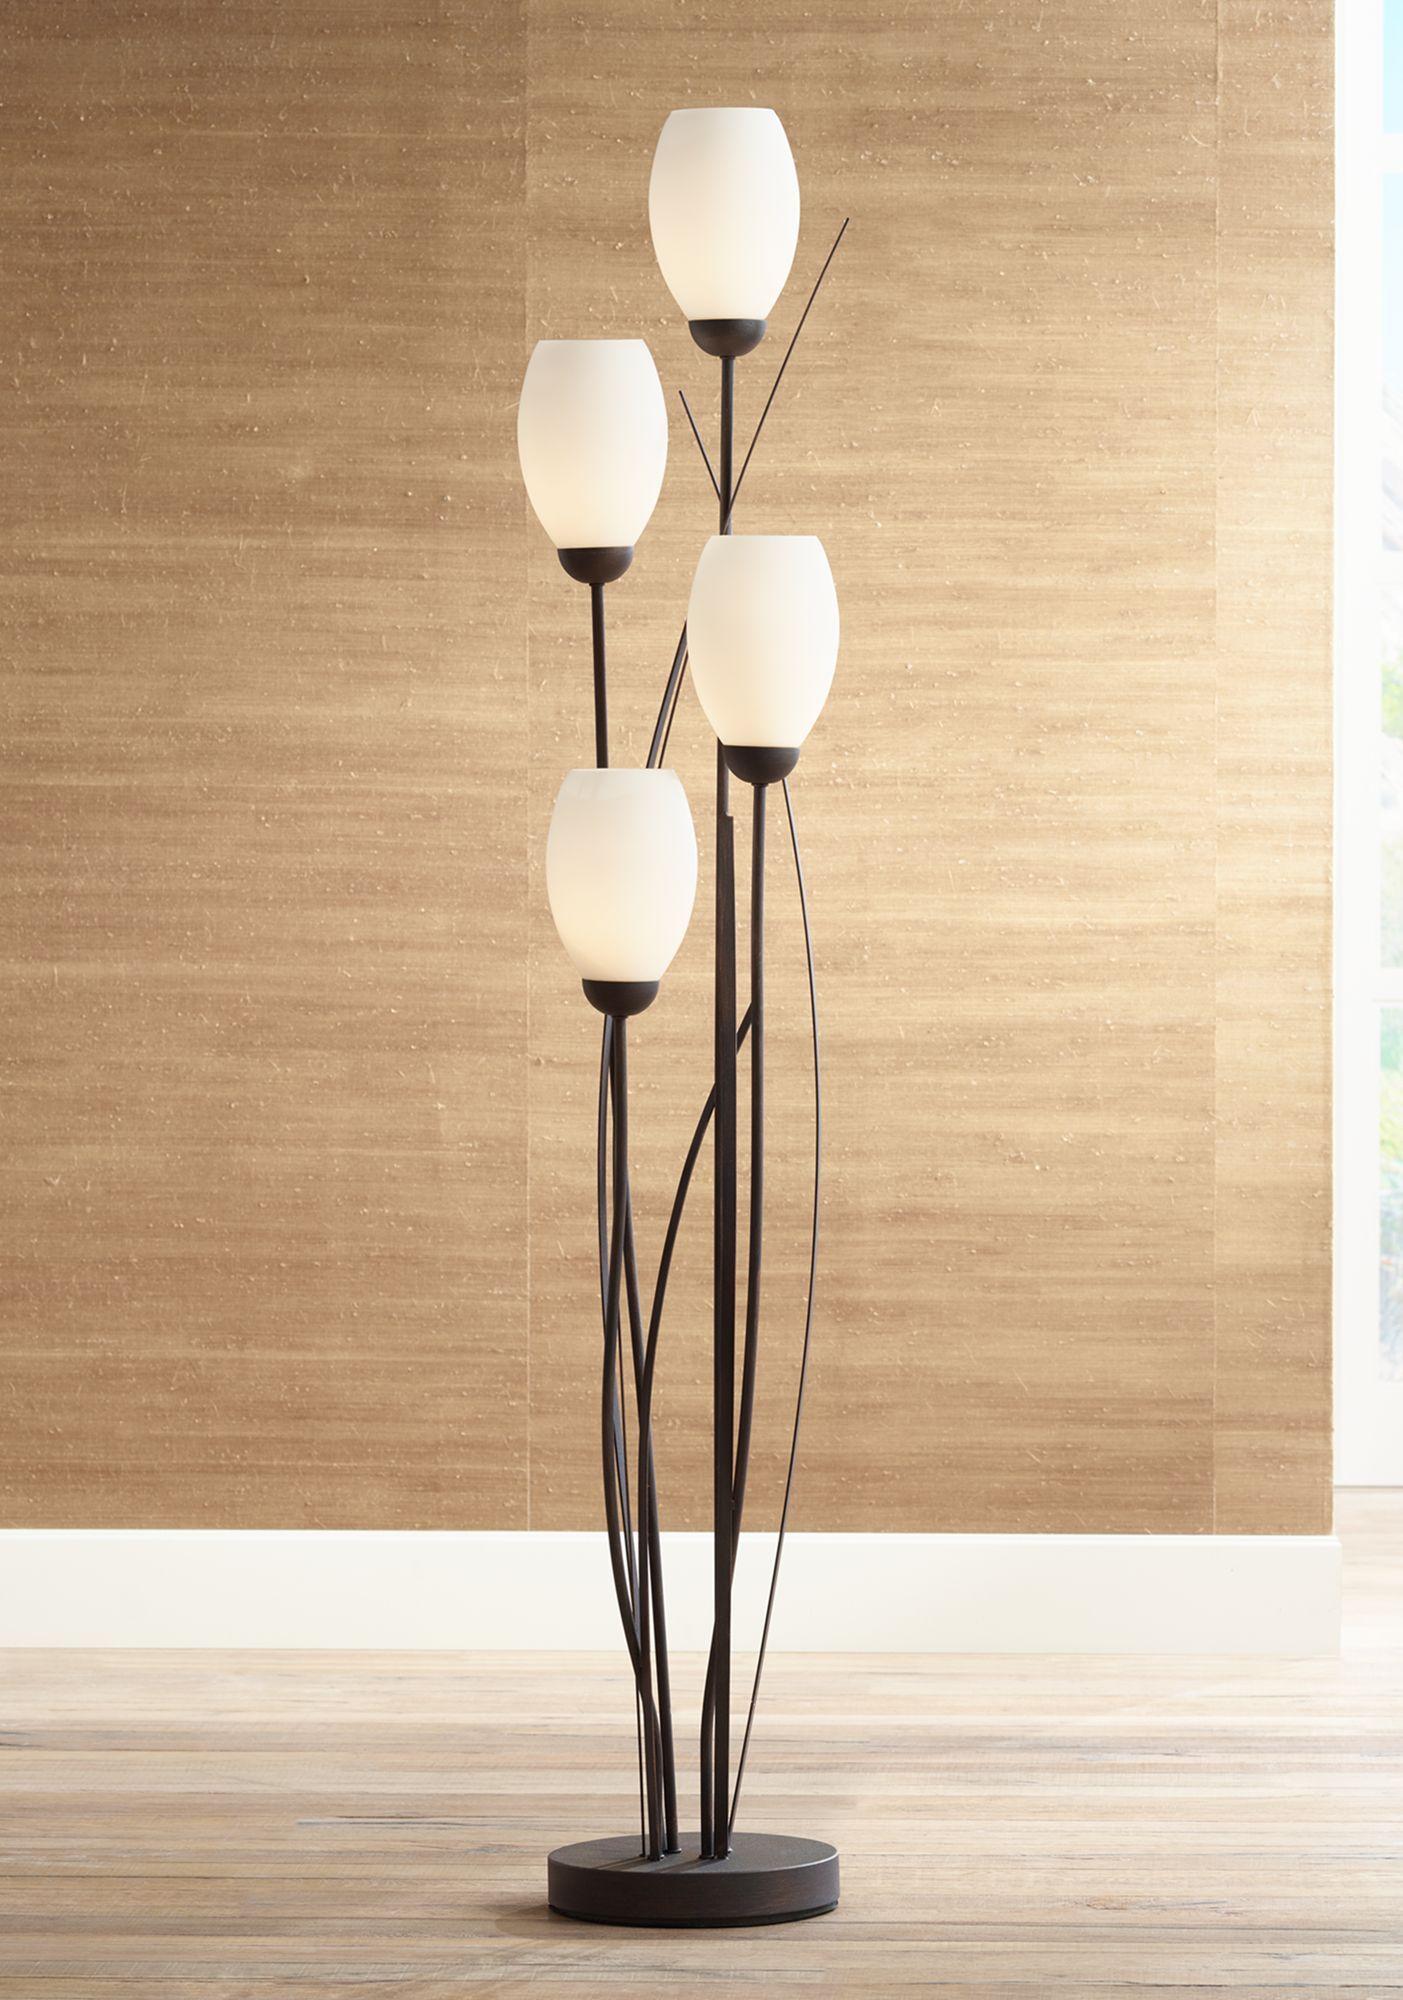 Standing Lamps Illuminate Dark Corners At Home Floor Lamp